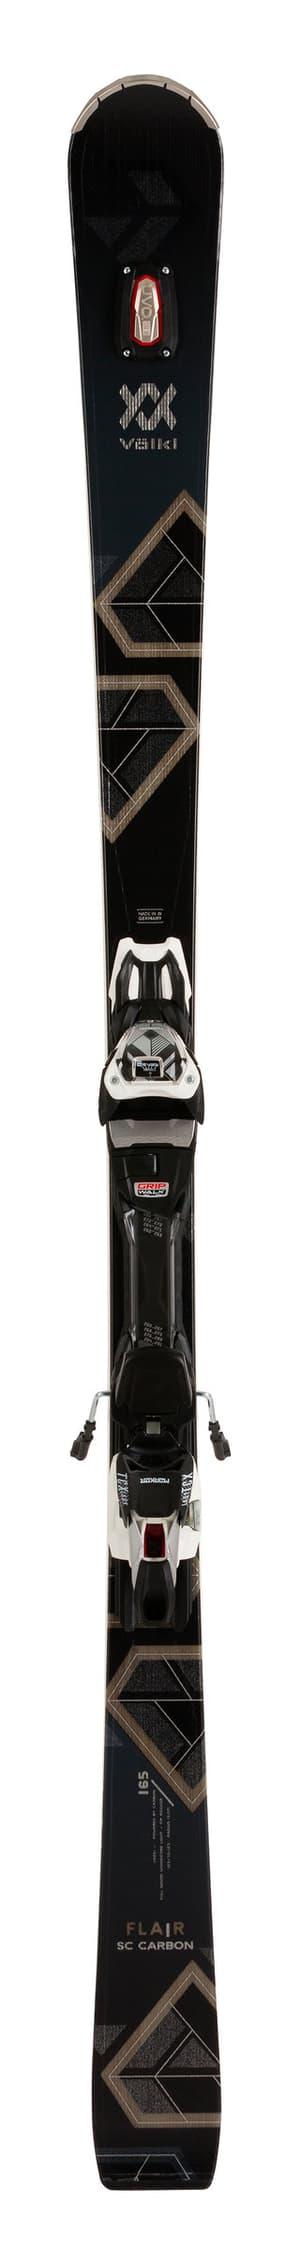 Flair SC Carbon inkl. VMotion 11 GW